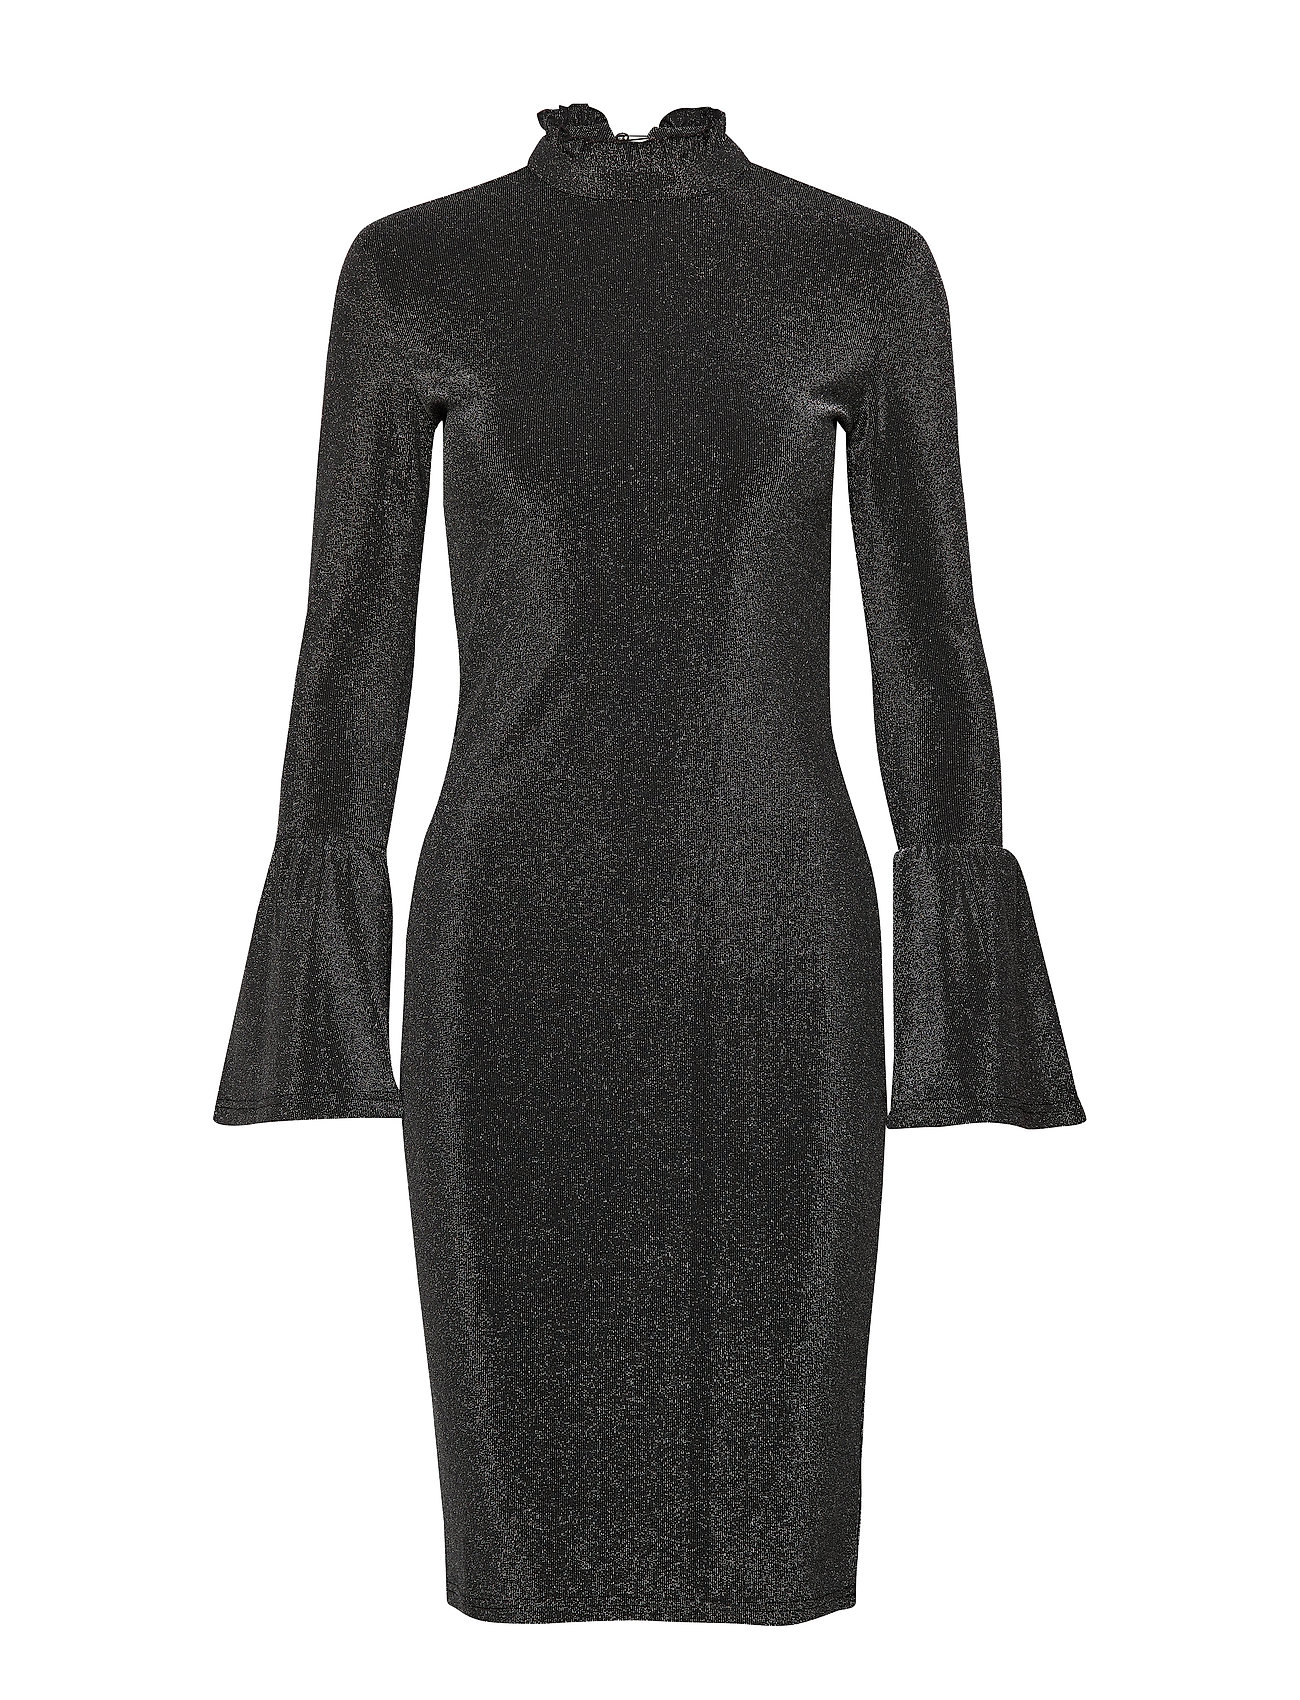 YAS YASJENNIFER LS DRESS - SHOW - BLACK